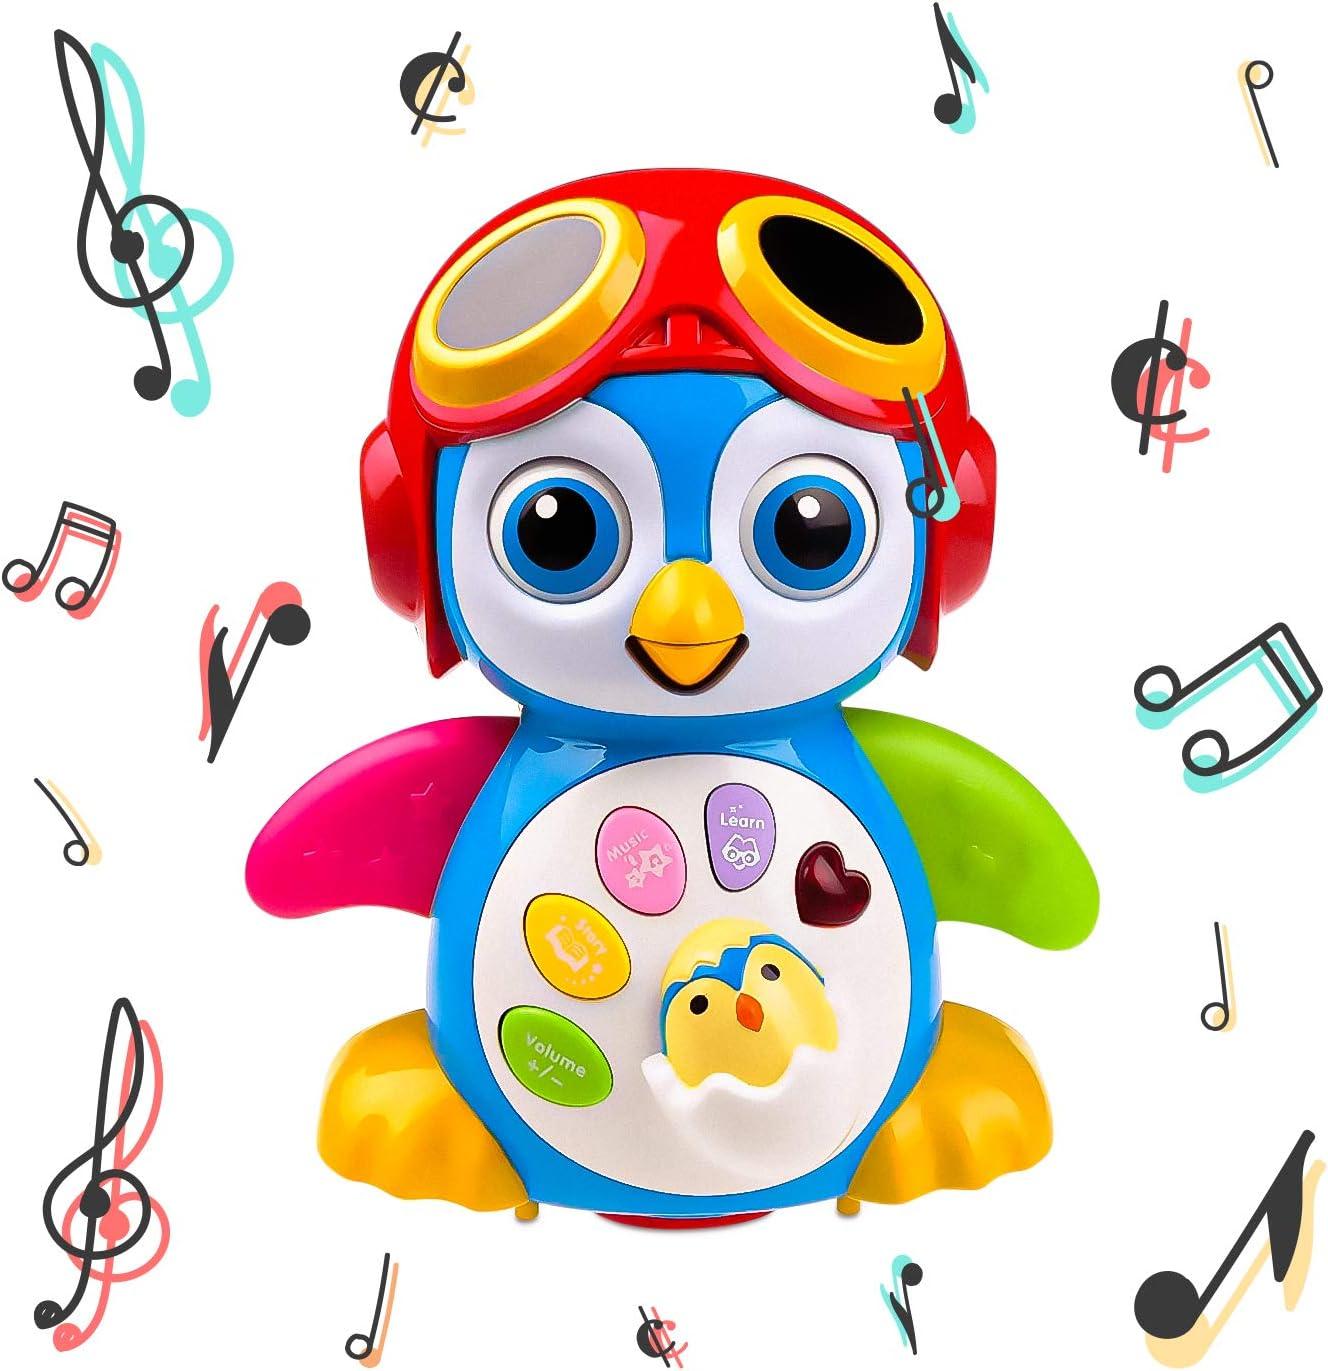 Dancing Penguin Toy Kids Toddler Musical Boy Girl Gift Learn Educational NEW